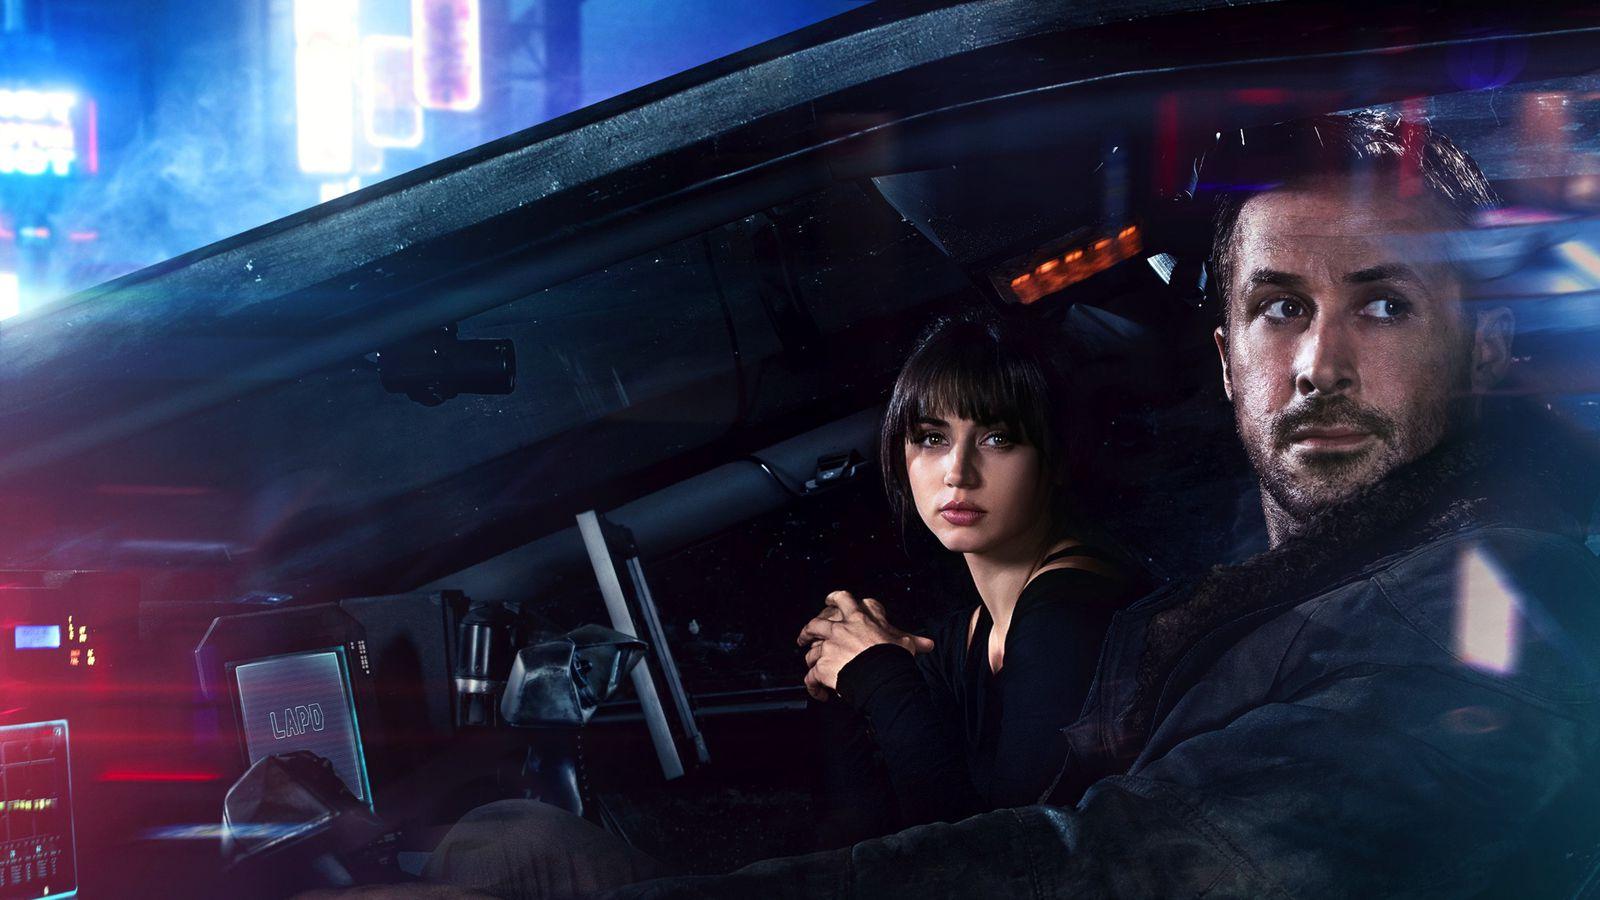 New trailers: Blade Runner 2049, Wonder Woman, Twin Peaks, and more